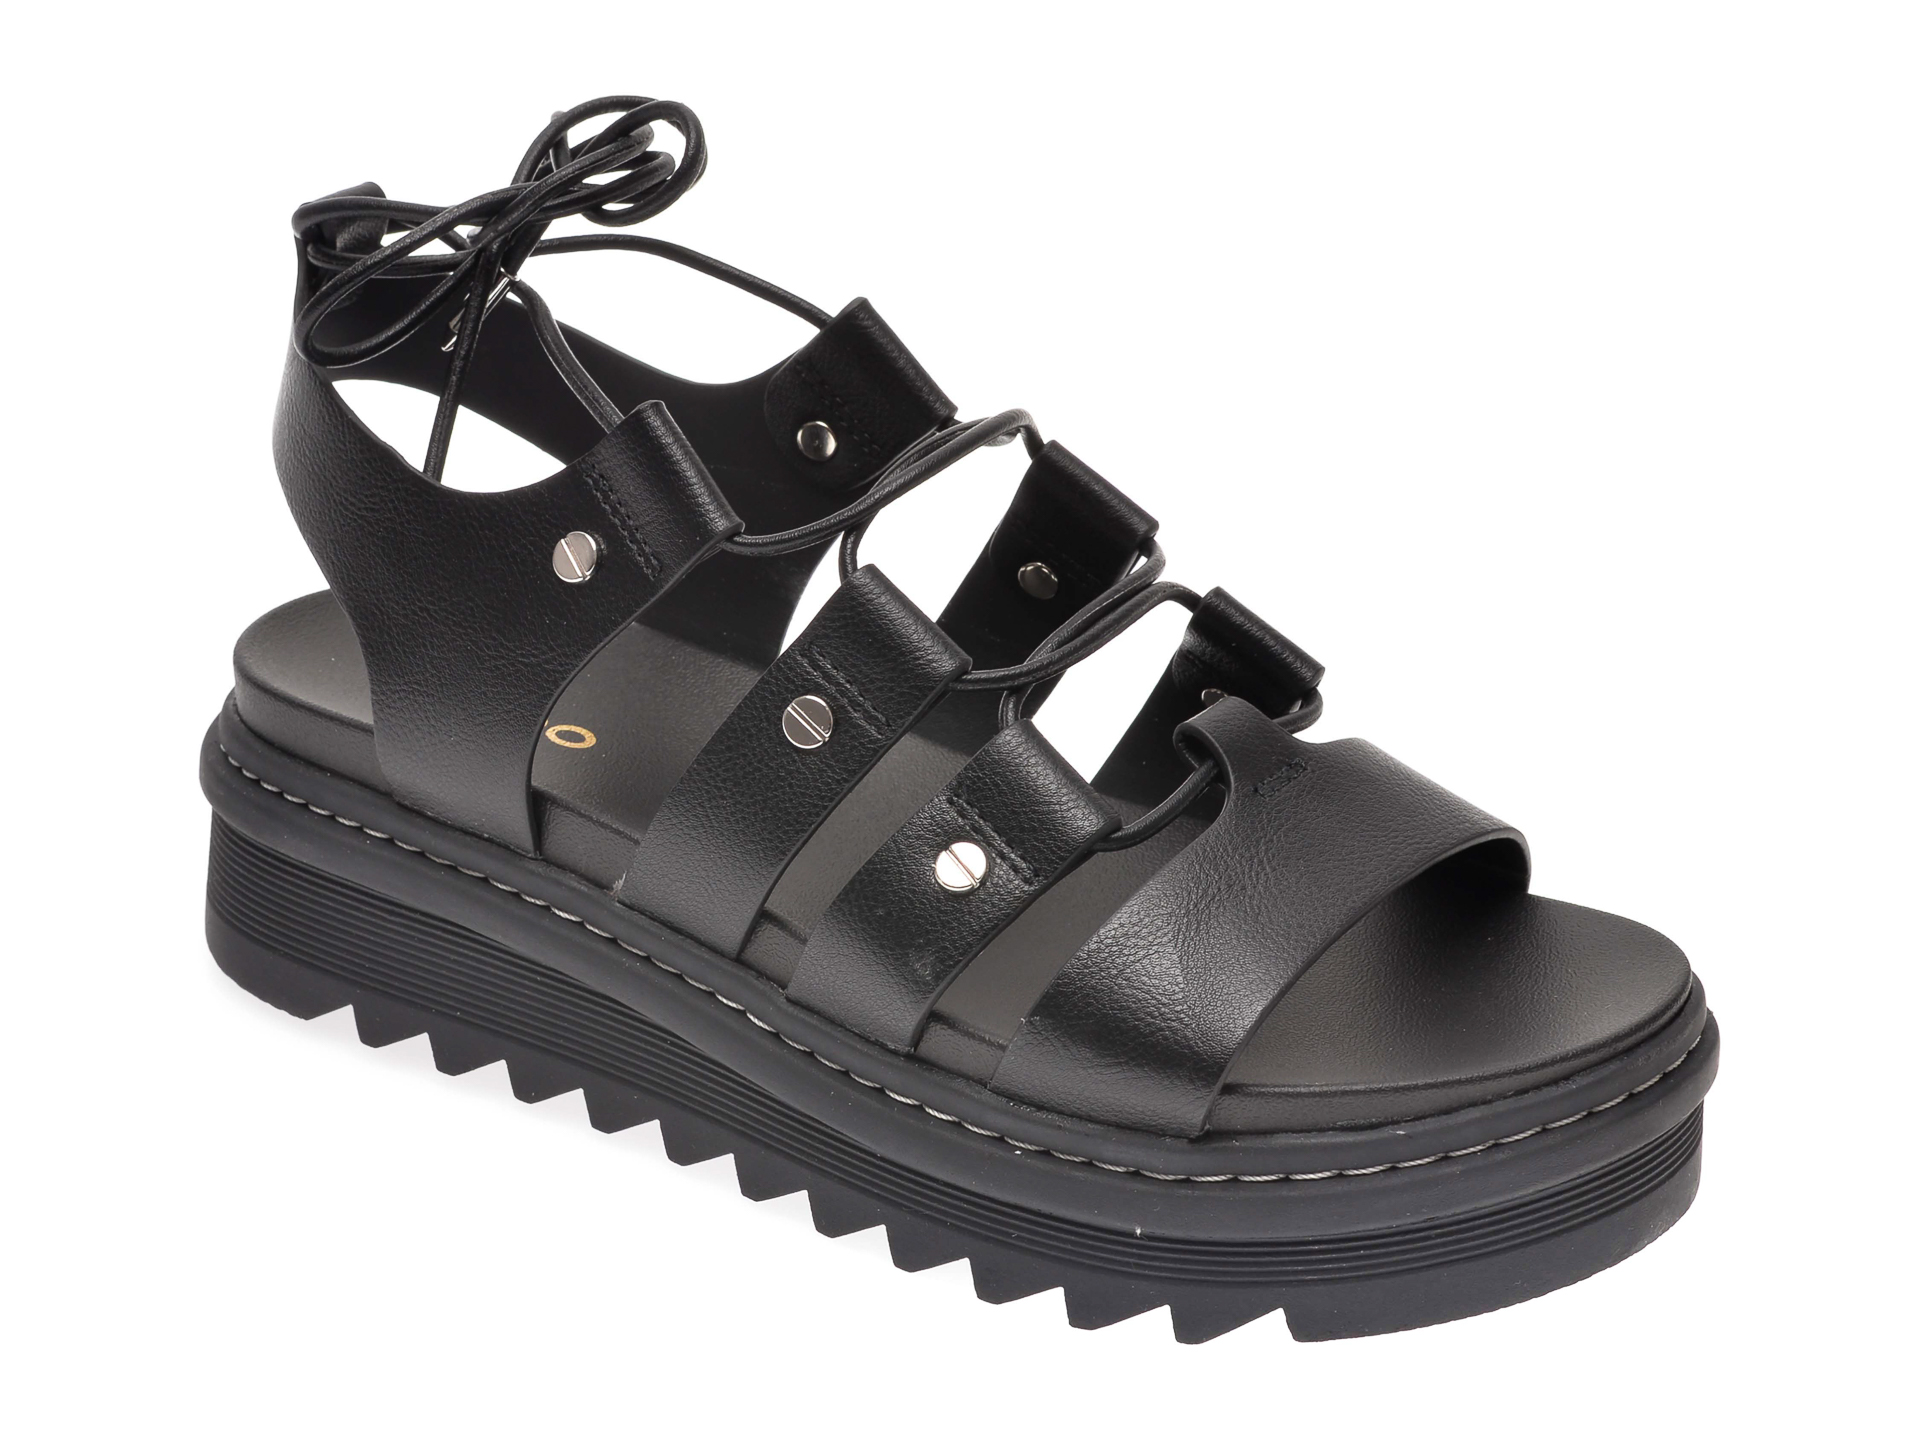 Sandale ALDO negre, Dasdez001, din piele ecologica New